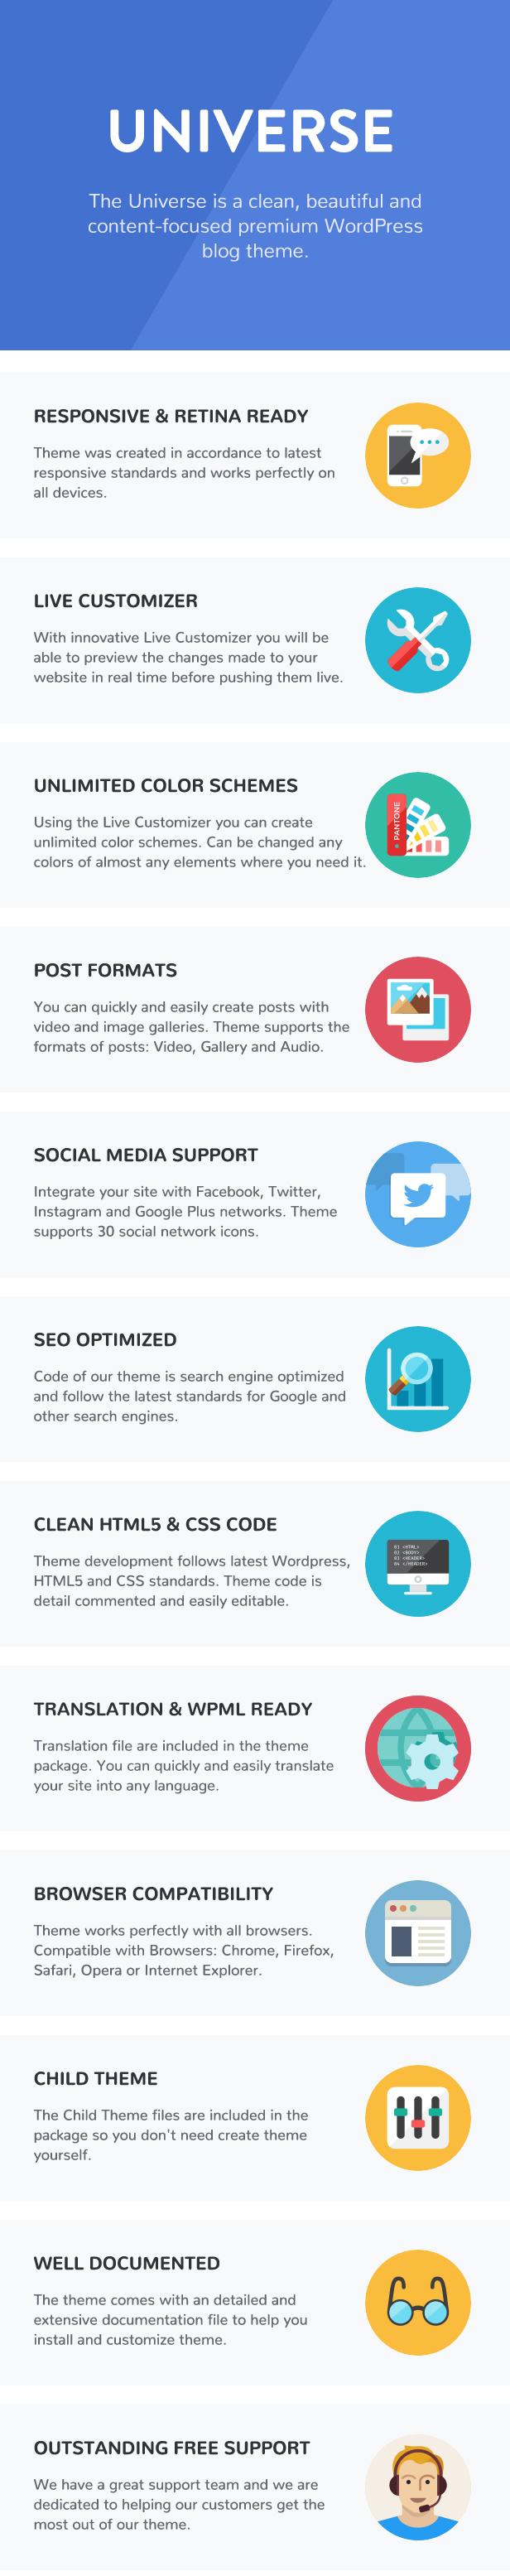 Universe - Clean & Minimal WordPress Blog Theme - 2